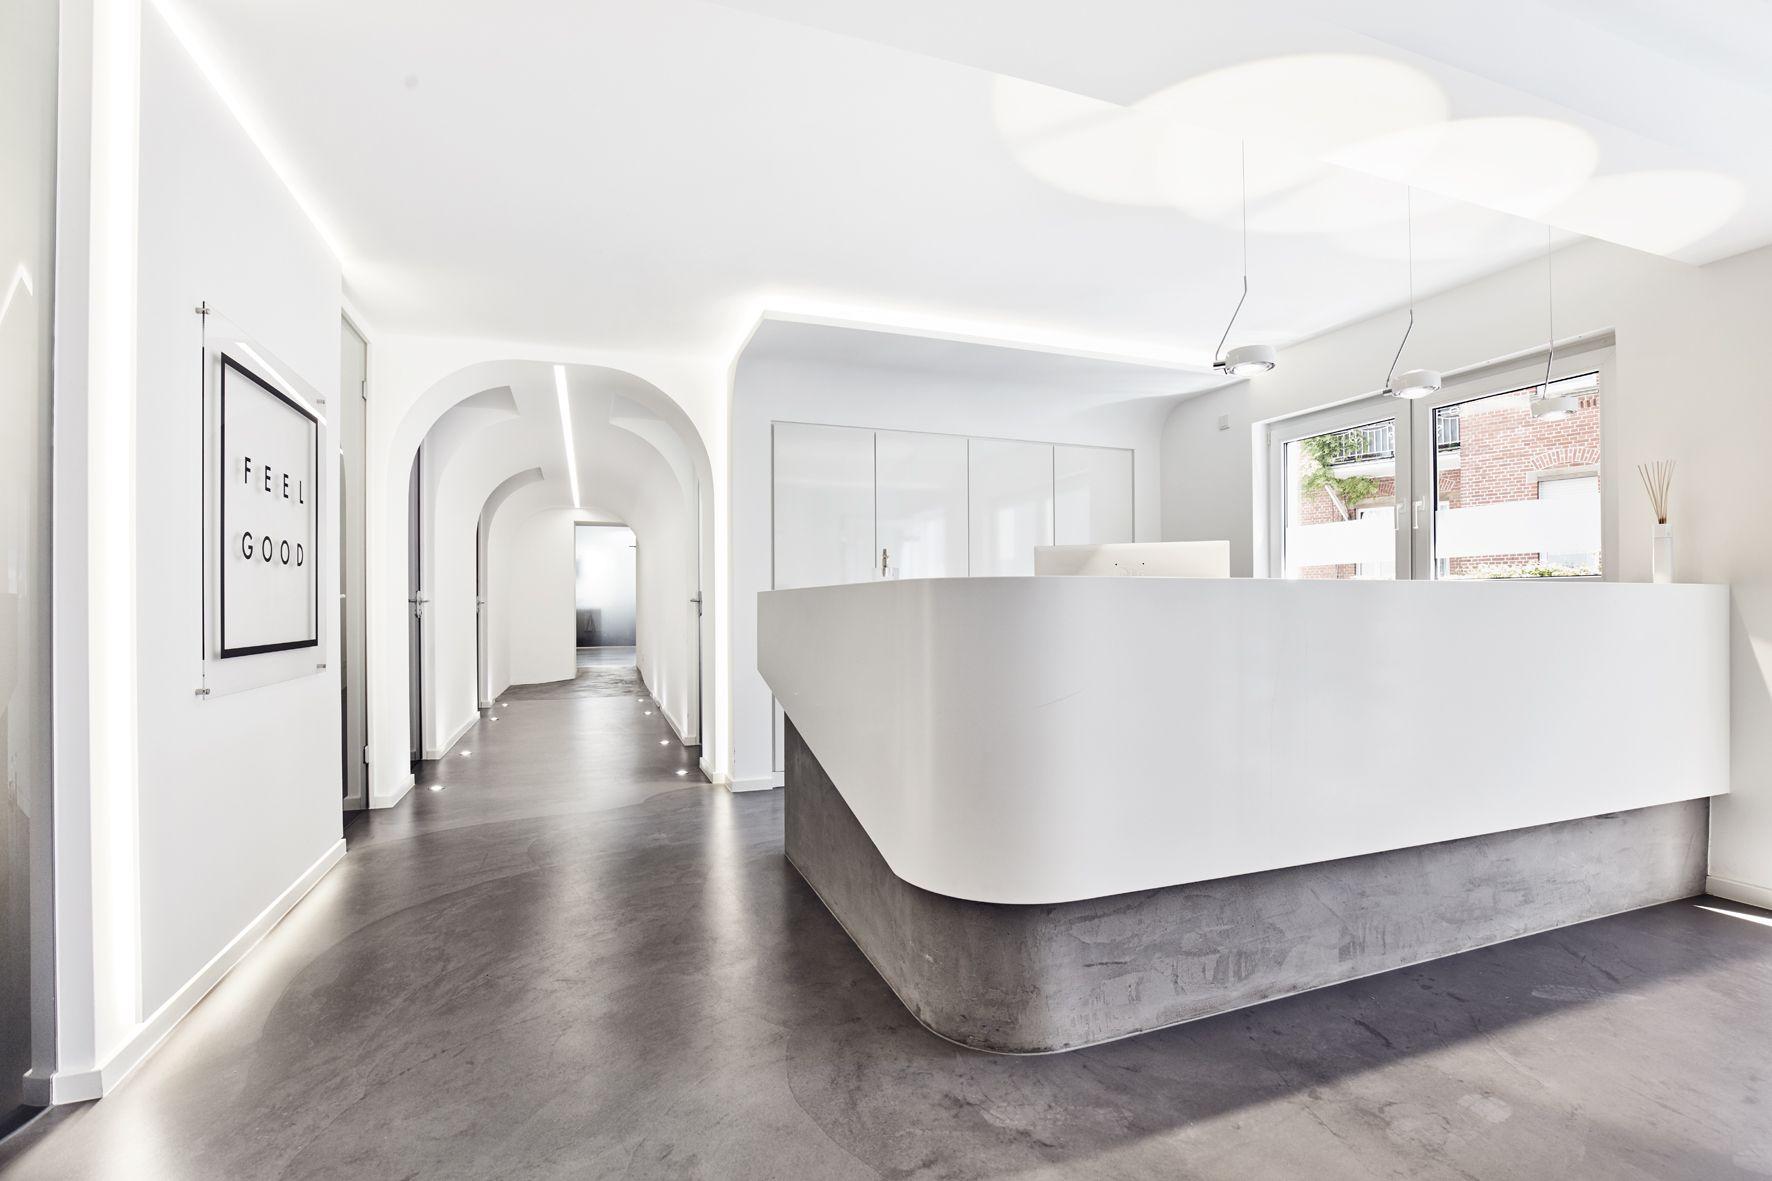 Mann Mobel Empfangstheke Passt Sich Wunderbar In Die Architektur Ein Empfangstheke Architektur Theken